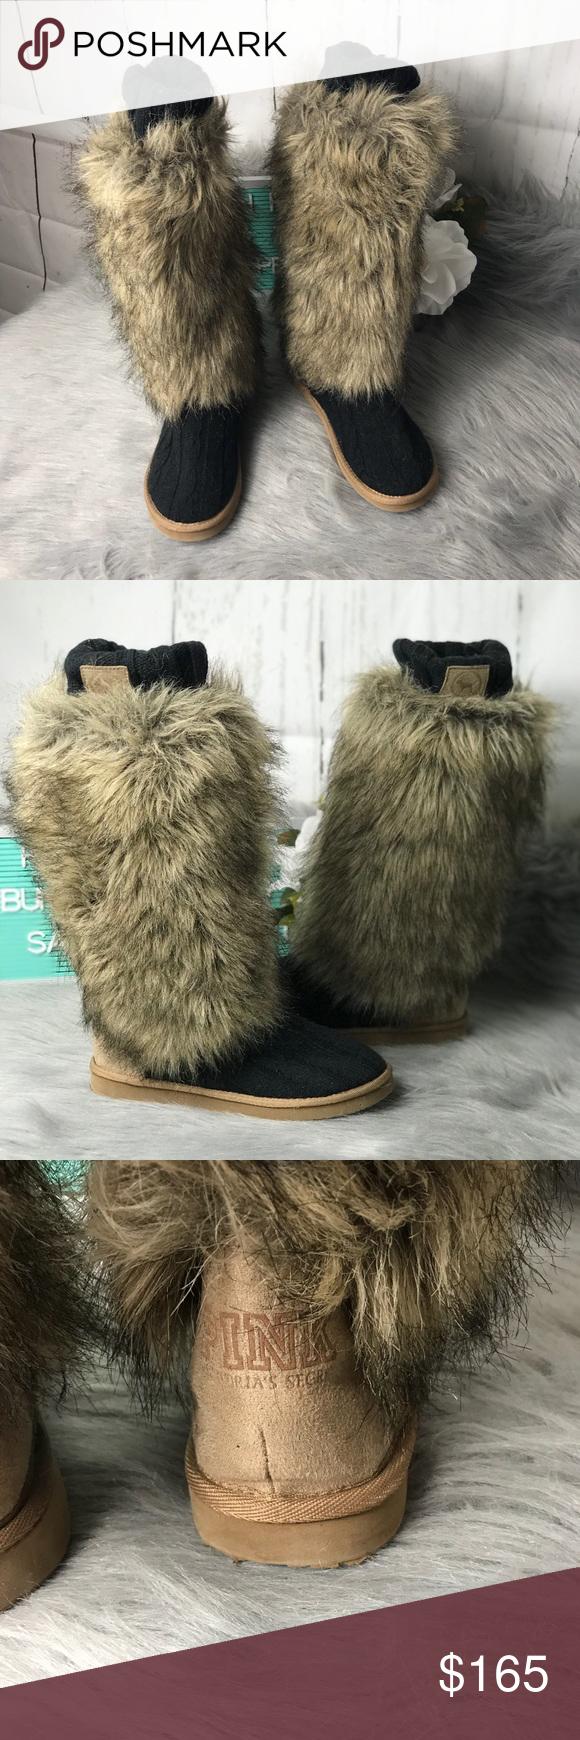 "3d6cdf6779 Pink Victoria Secret Fur Sweater Boots Size 7-8 M Pink Victoria Secret Fur Sweater  Boots Size 7-8 M Excellent Condition No Box No Trades 15"" Tall Tag Size ..."